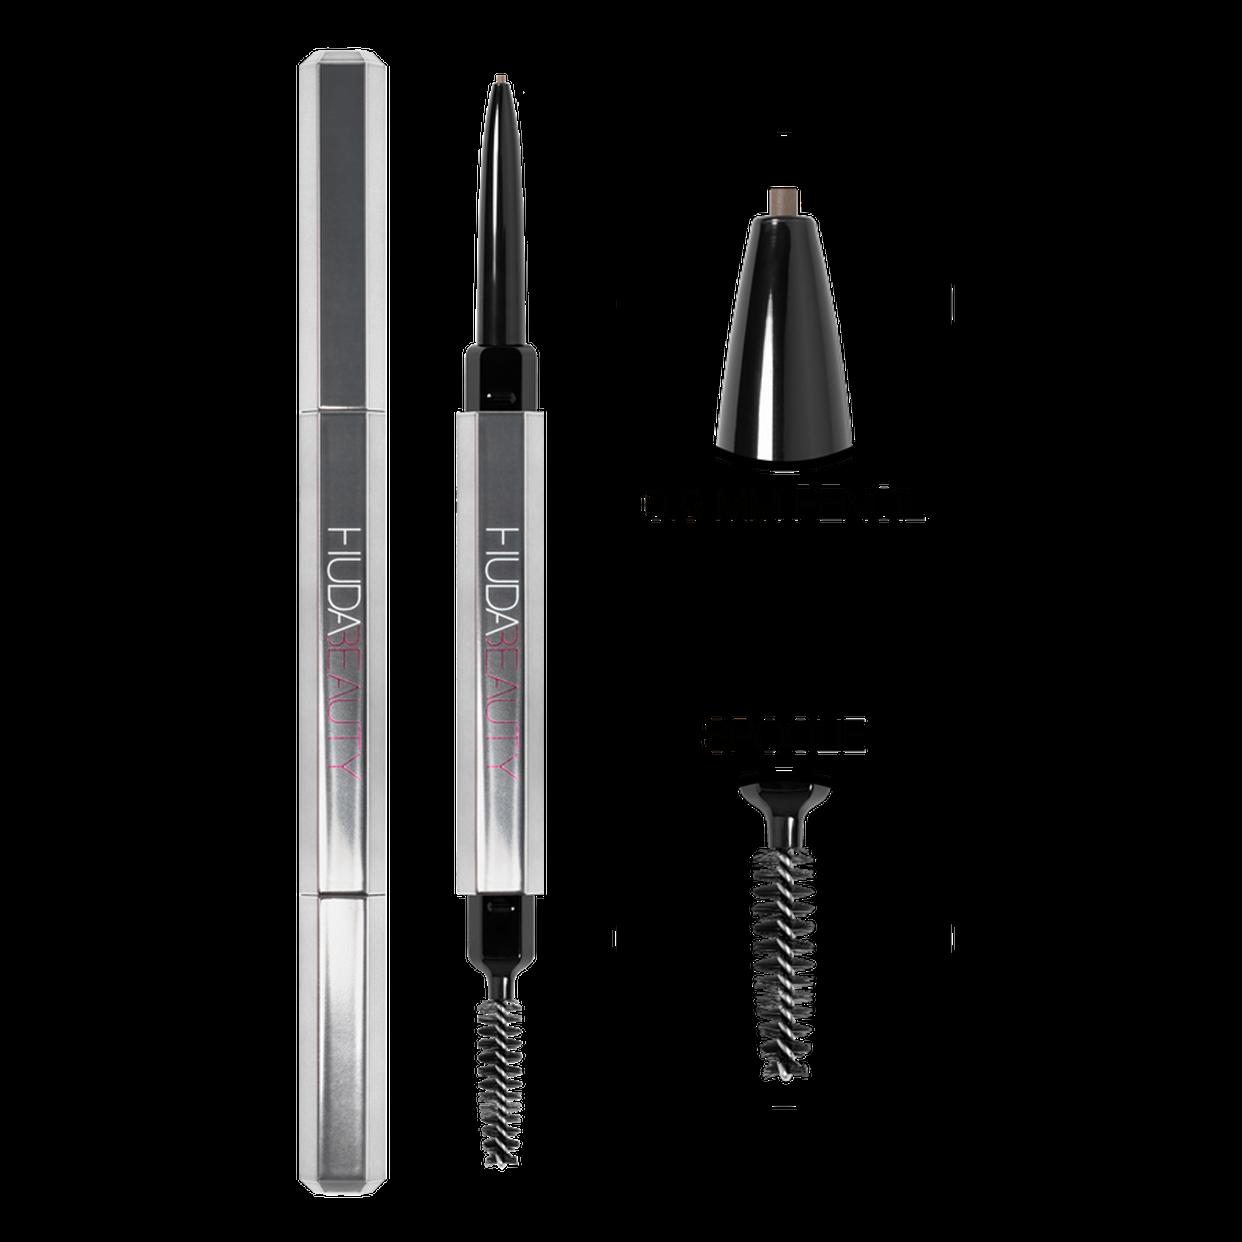 HUDA Beauty #BOMBROWS Microshade Brow Pencil